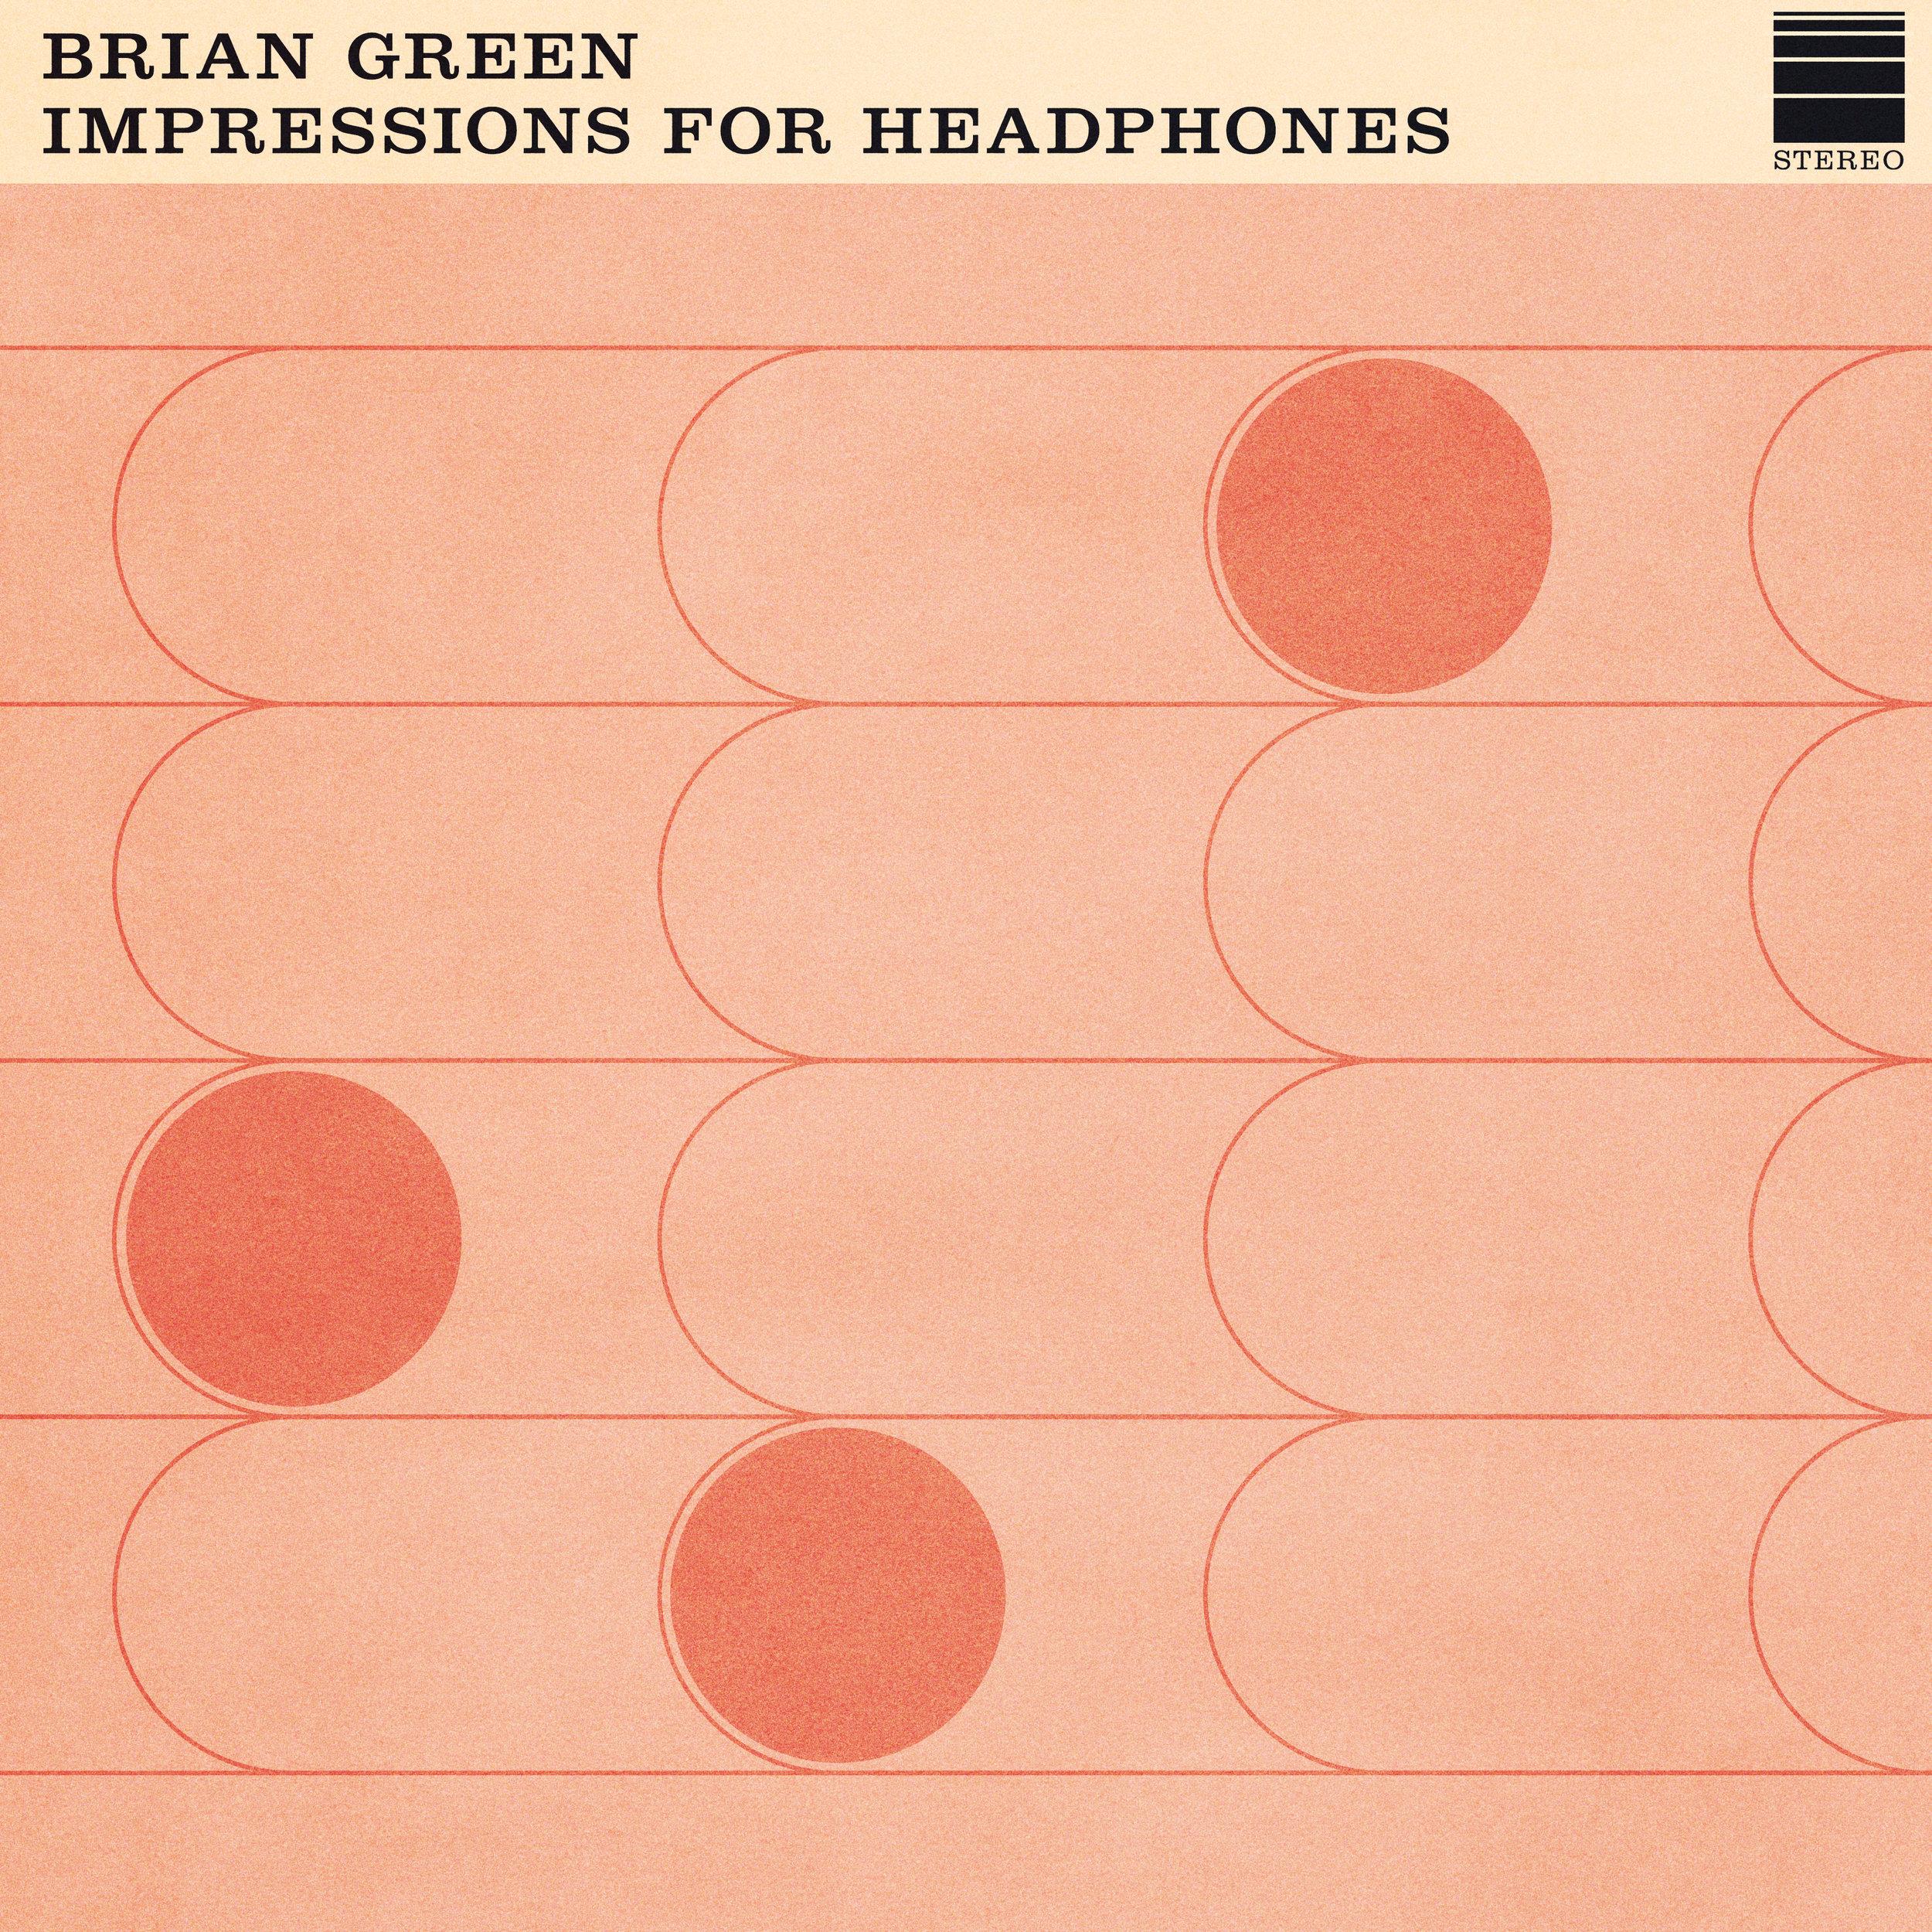 brian green 4.jpg